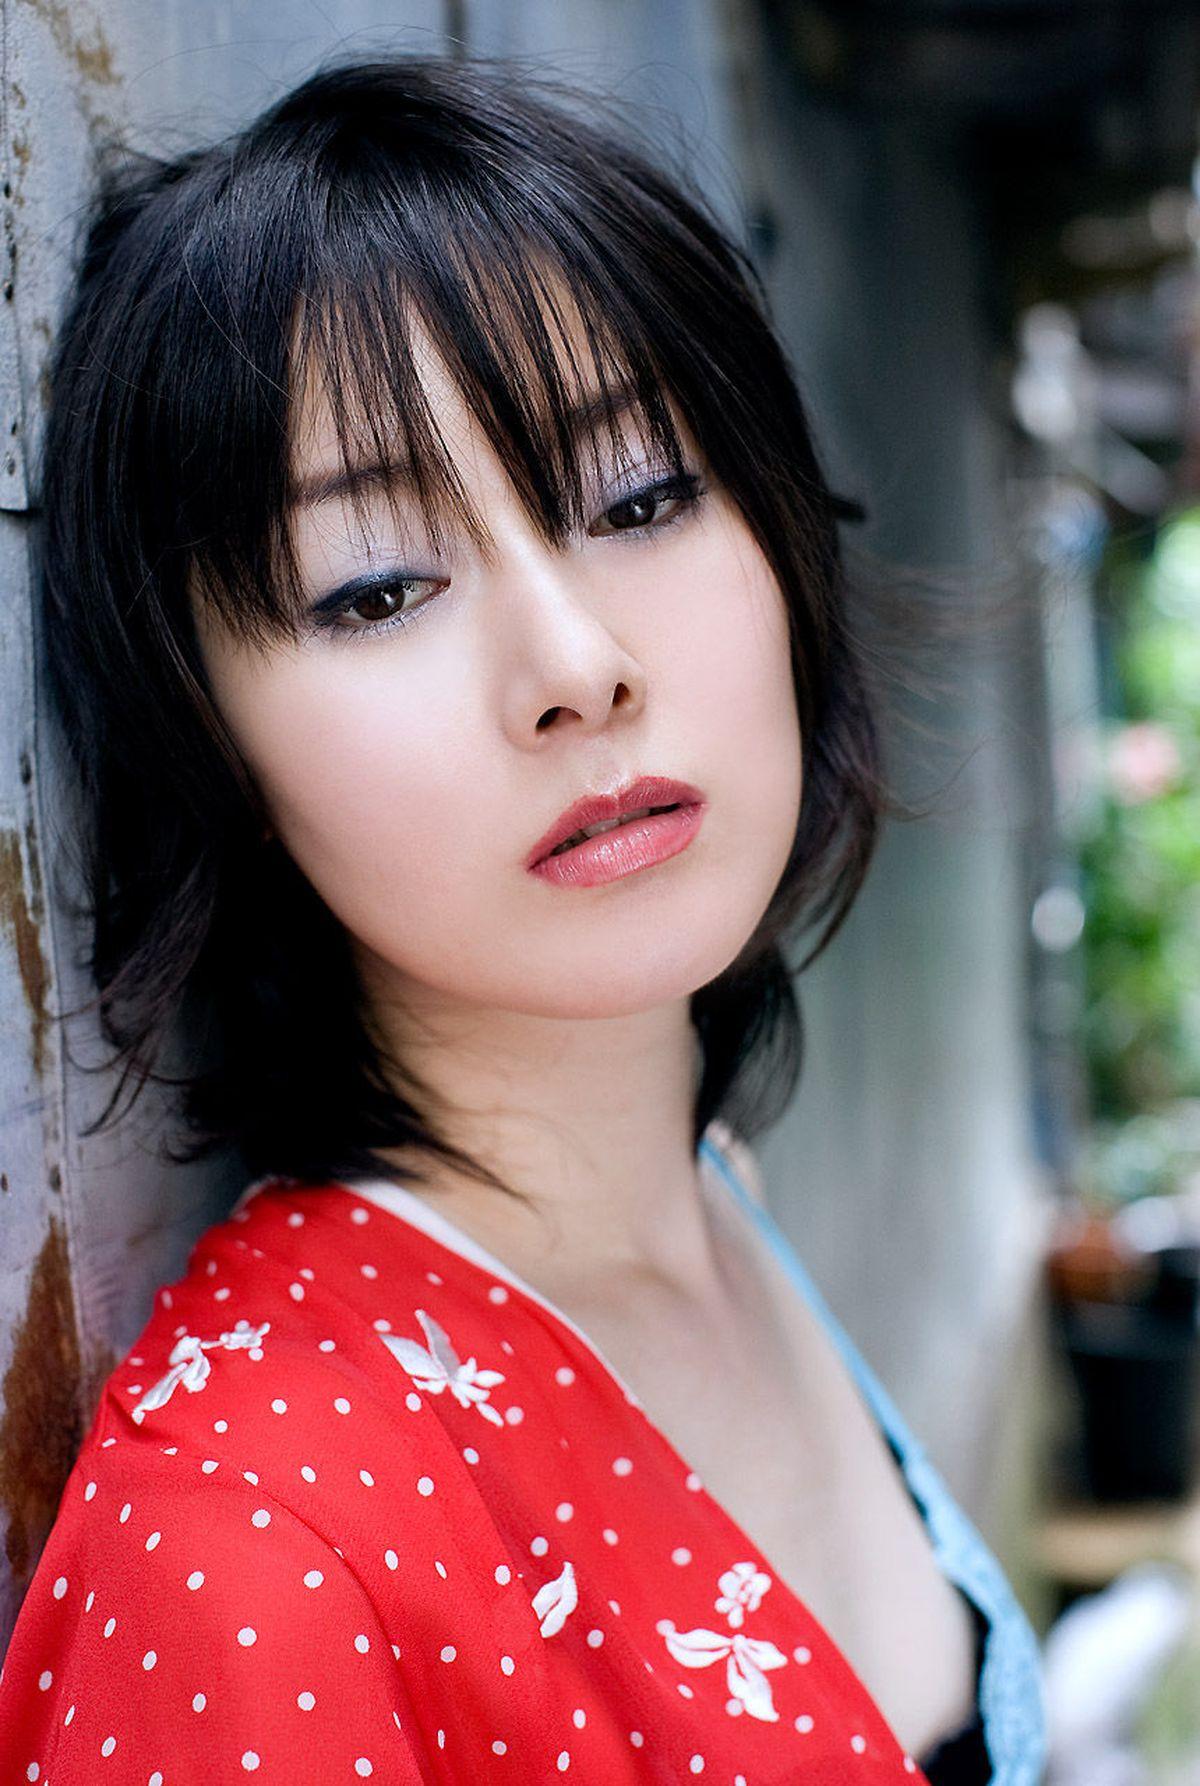 远野凪子(Nagiko Tono)-[image.tv套图]